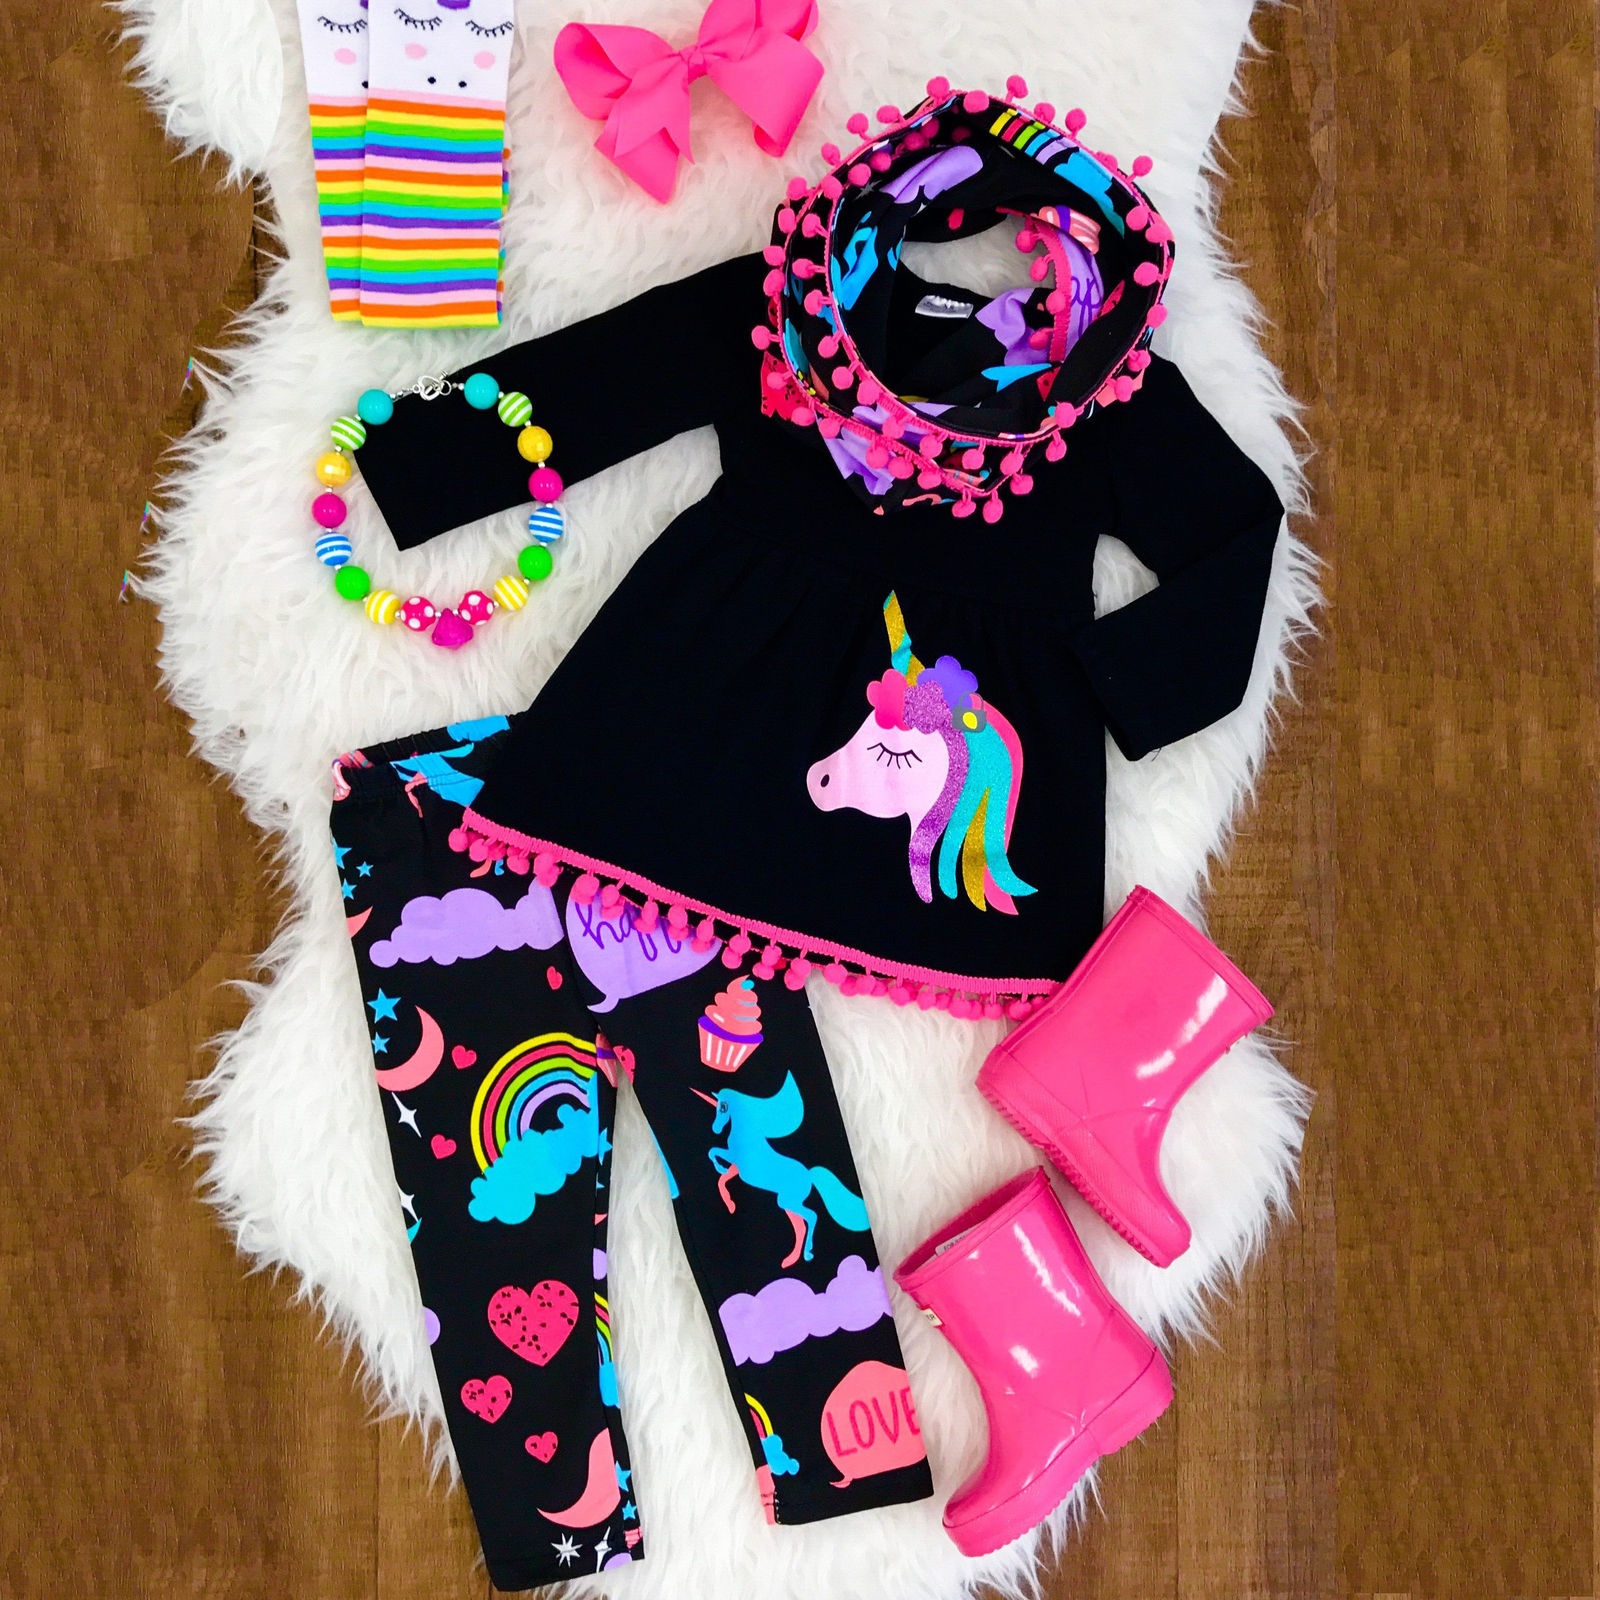 Gyratedream Autumn Baby Girl Outerwear Rainbow Striped Hoodie Zipper Sweatshirt Kids Coat Outfits Tops